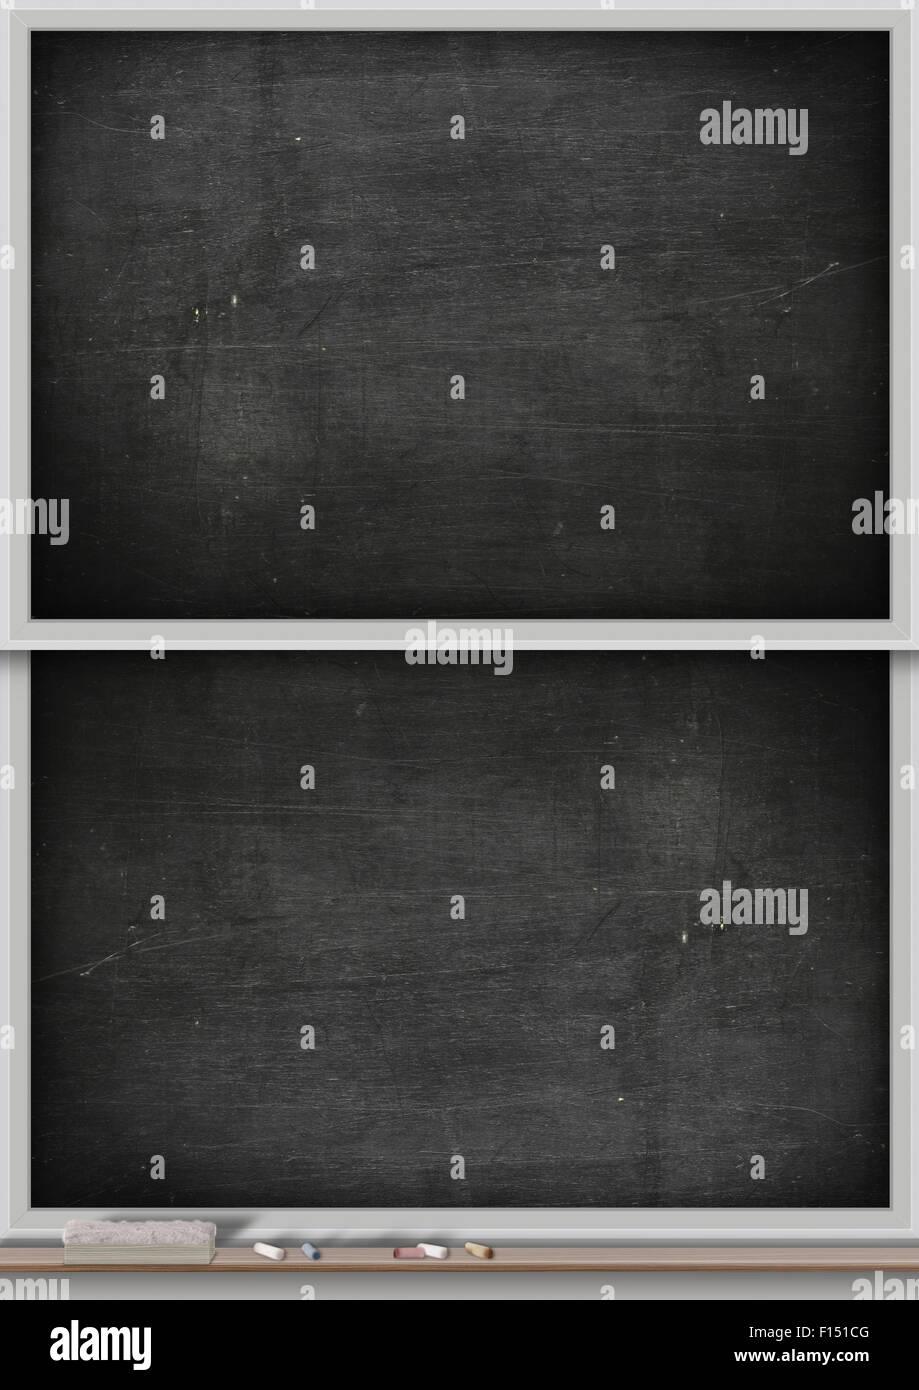 a rectangular black chalkboard